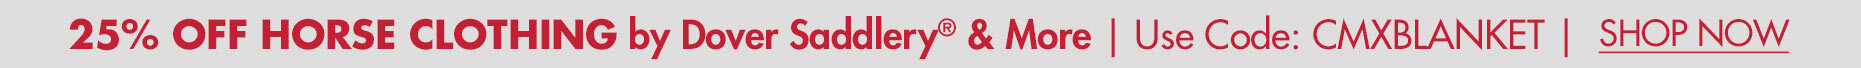 25% OFF Horse Clothing from Dover Saddlery, Horze, B Vertigo & Noble